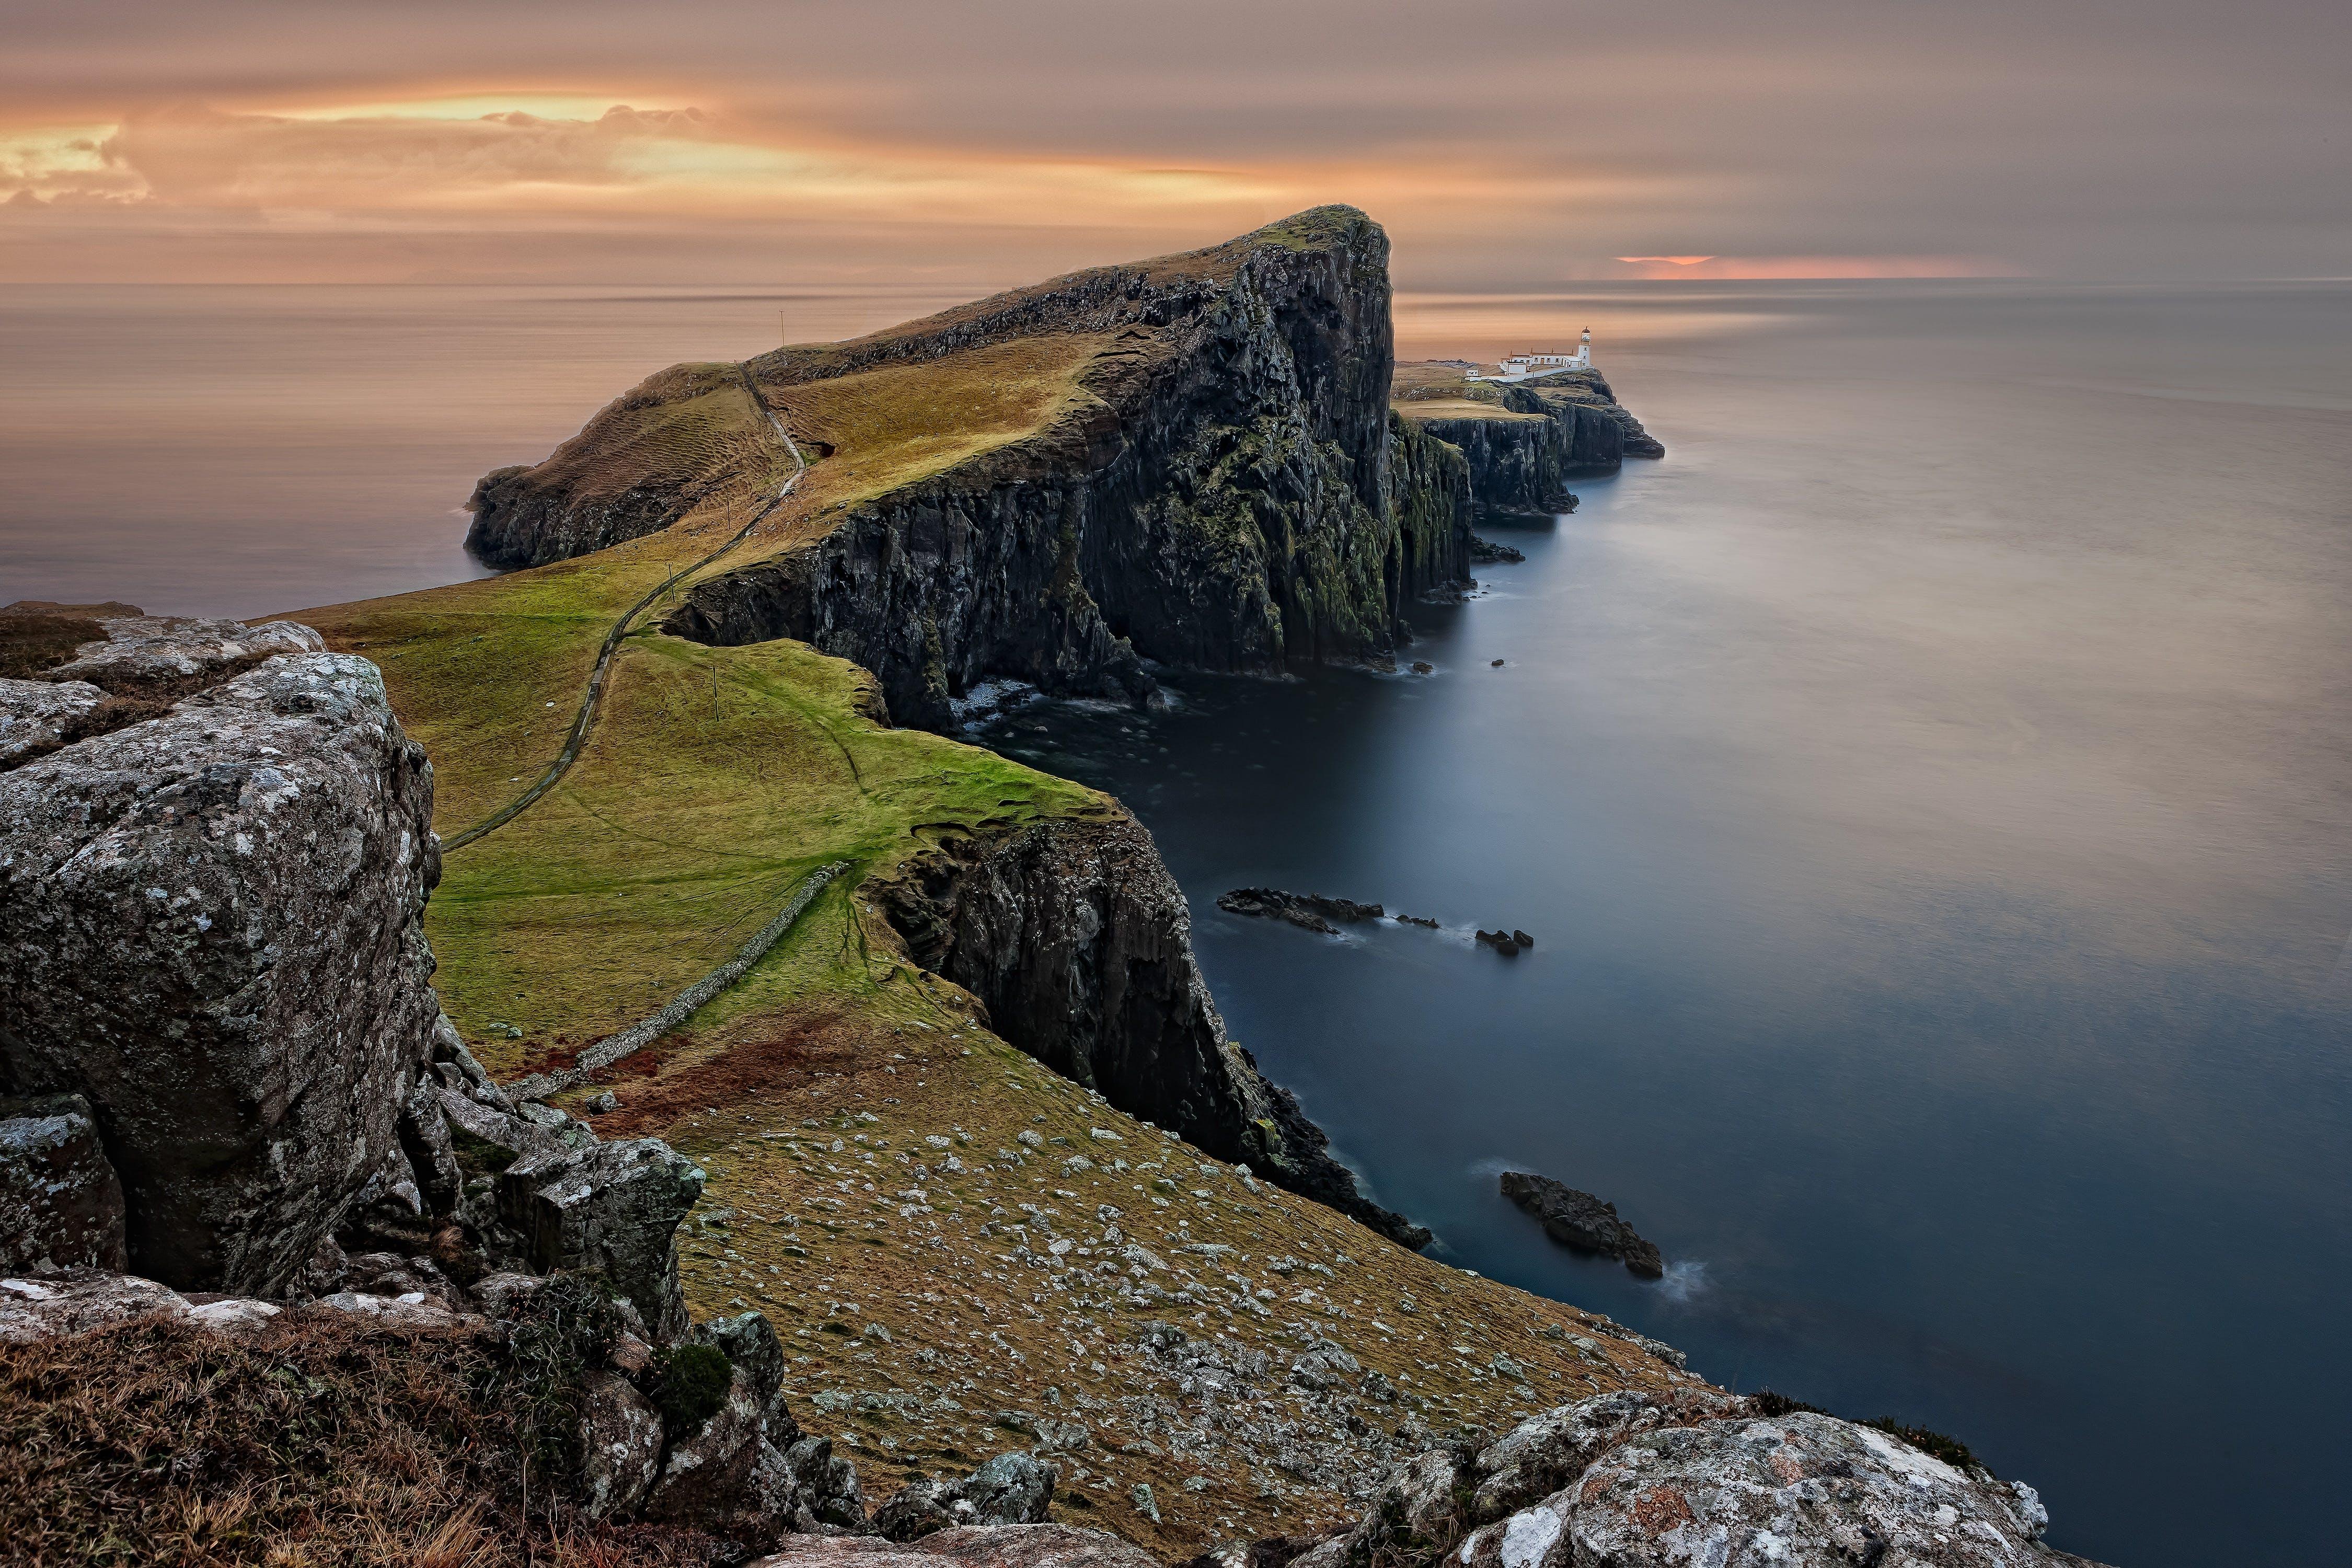 Green and Brown Mountain Cliffs Near Ocean